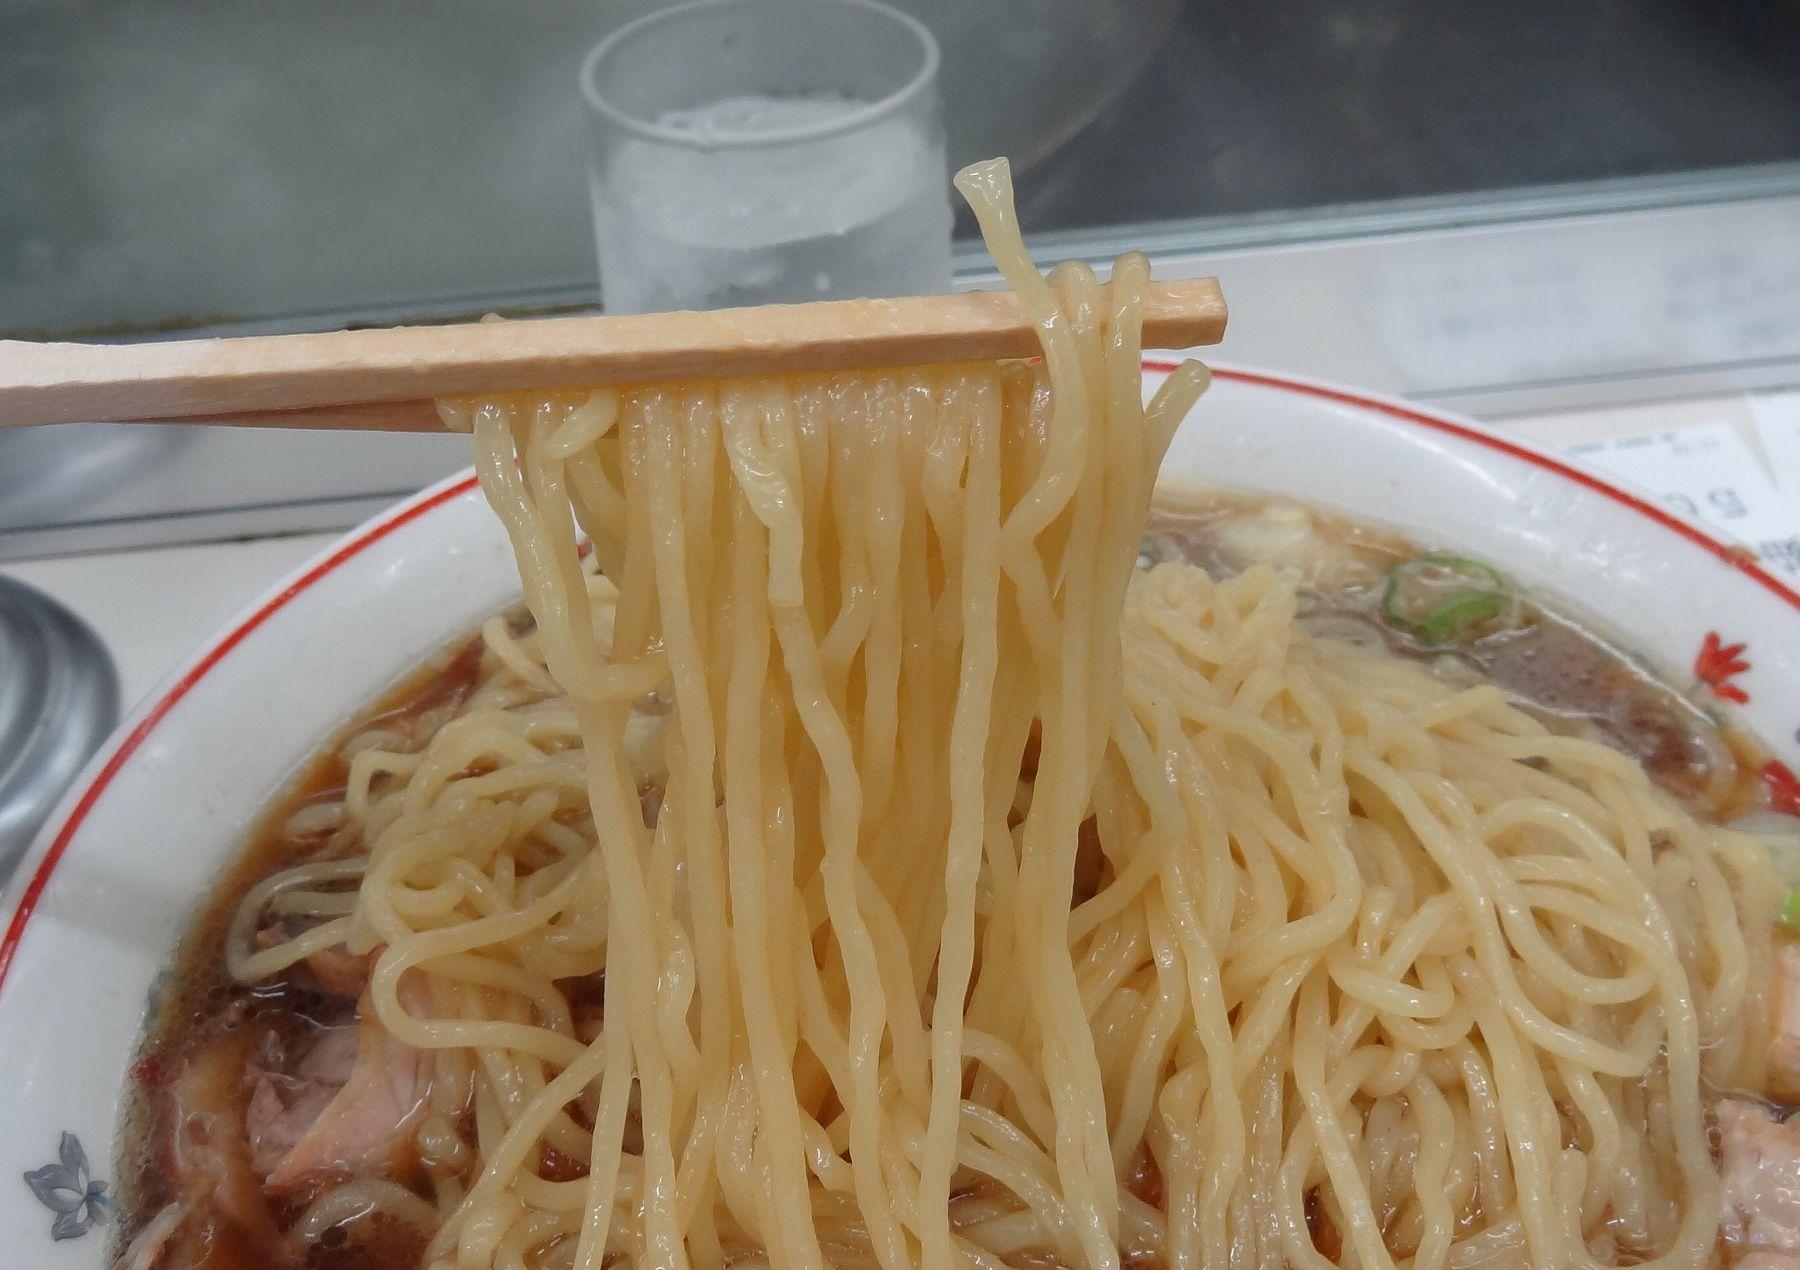 20121018004aoshima.jpg